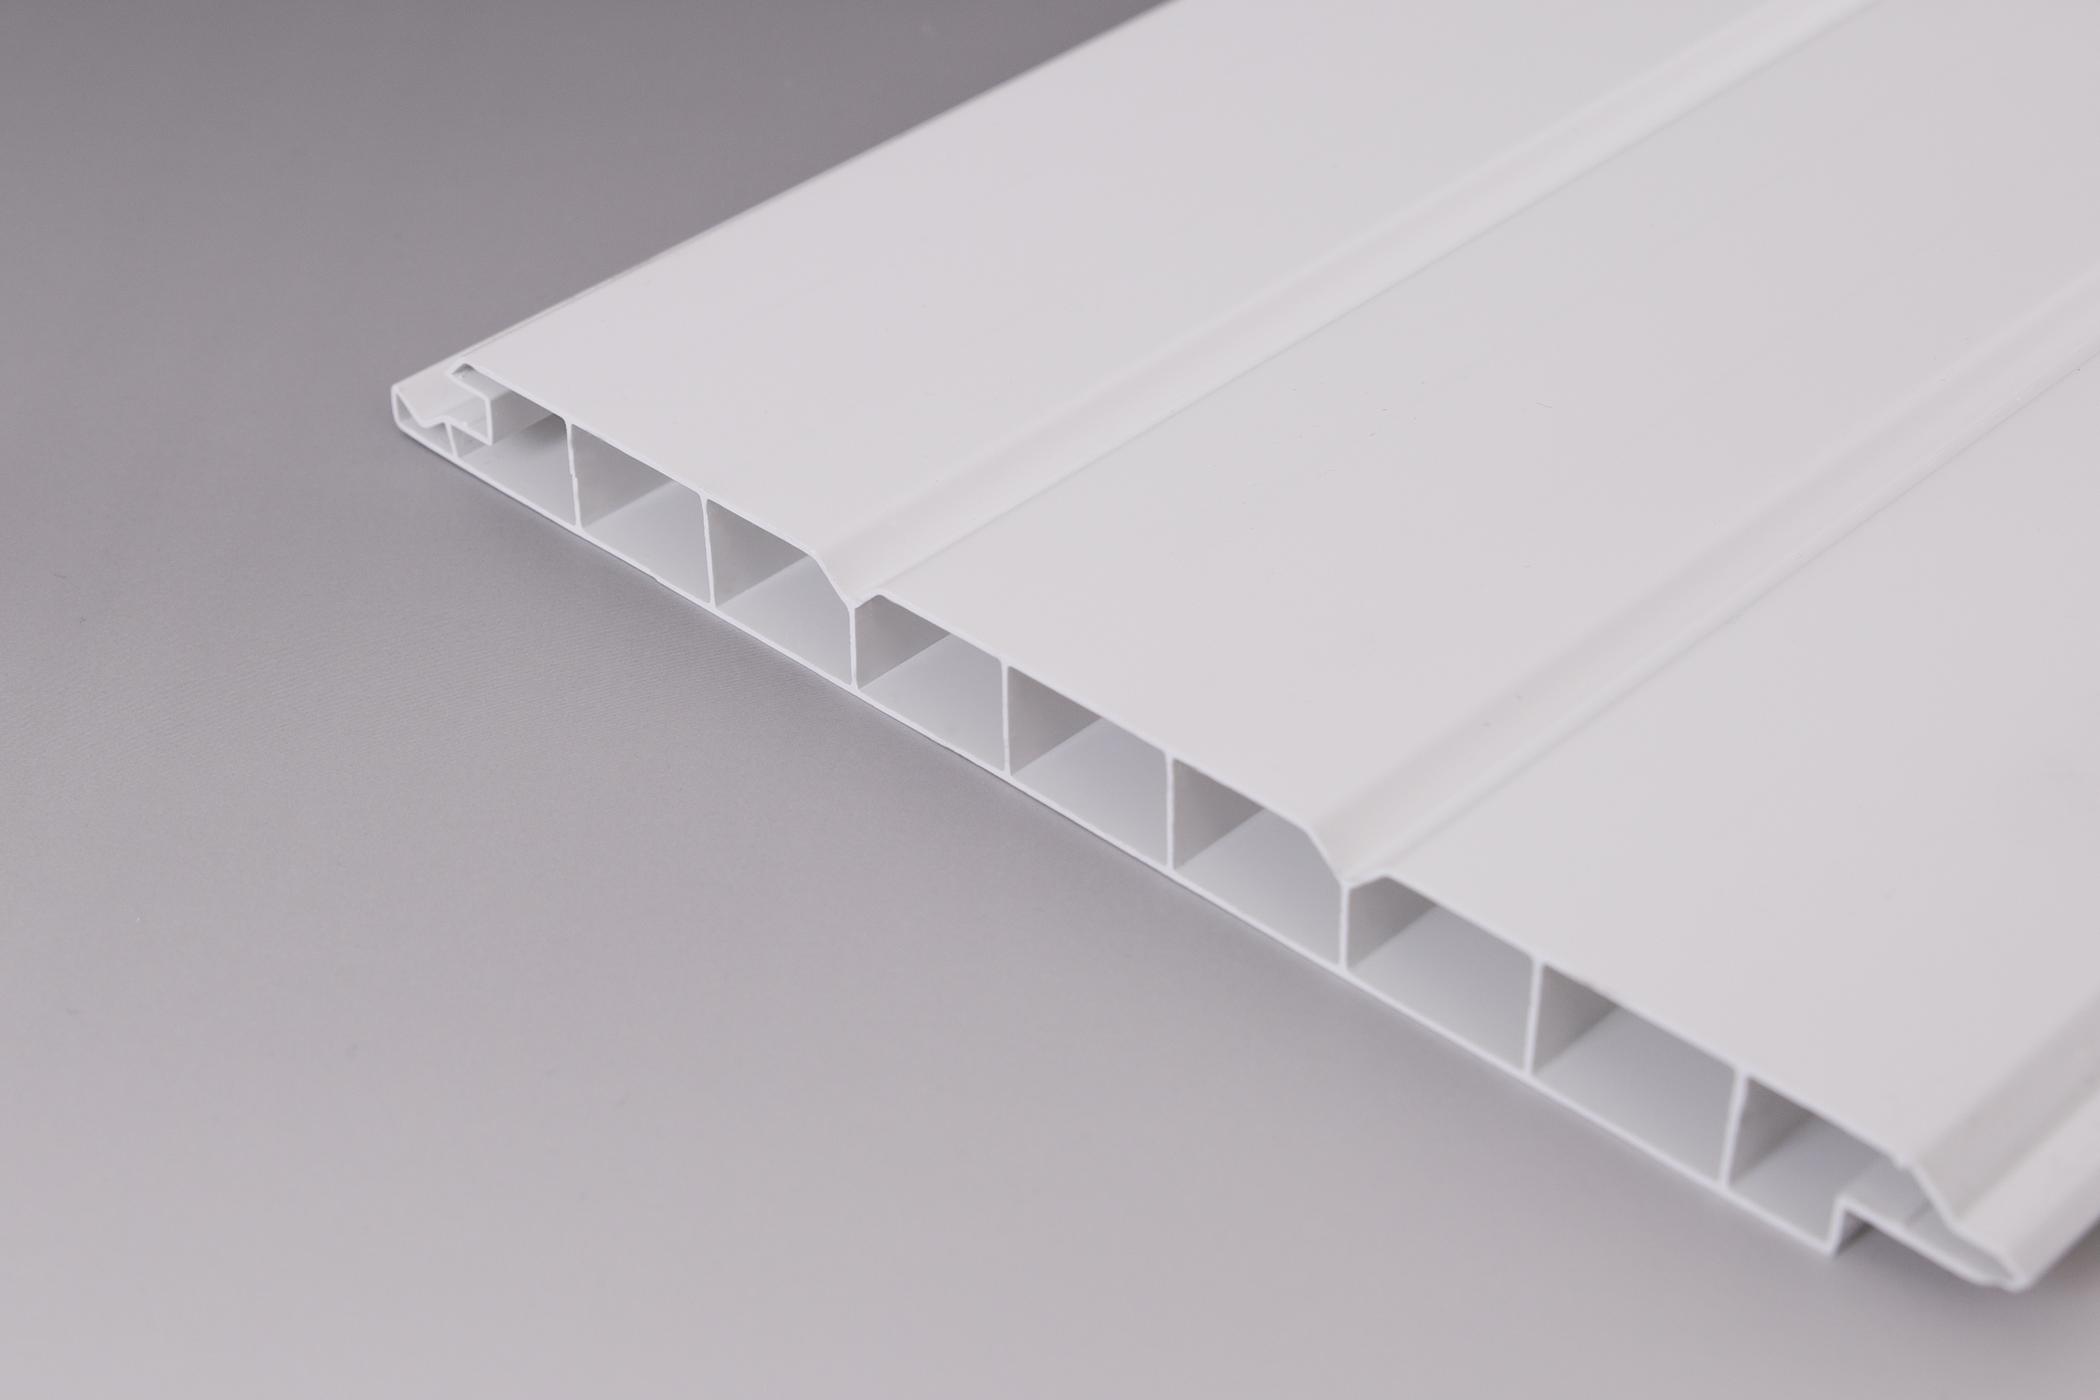 kunststoff deckenpaneele wei xo74 hitoiro. Black Bedroom Furniture Sets. Home Design Ideas